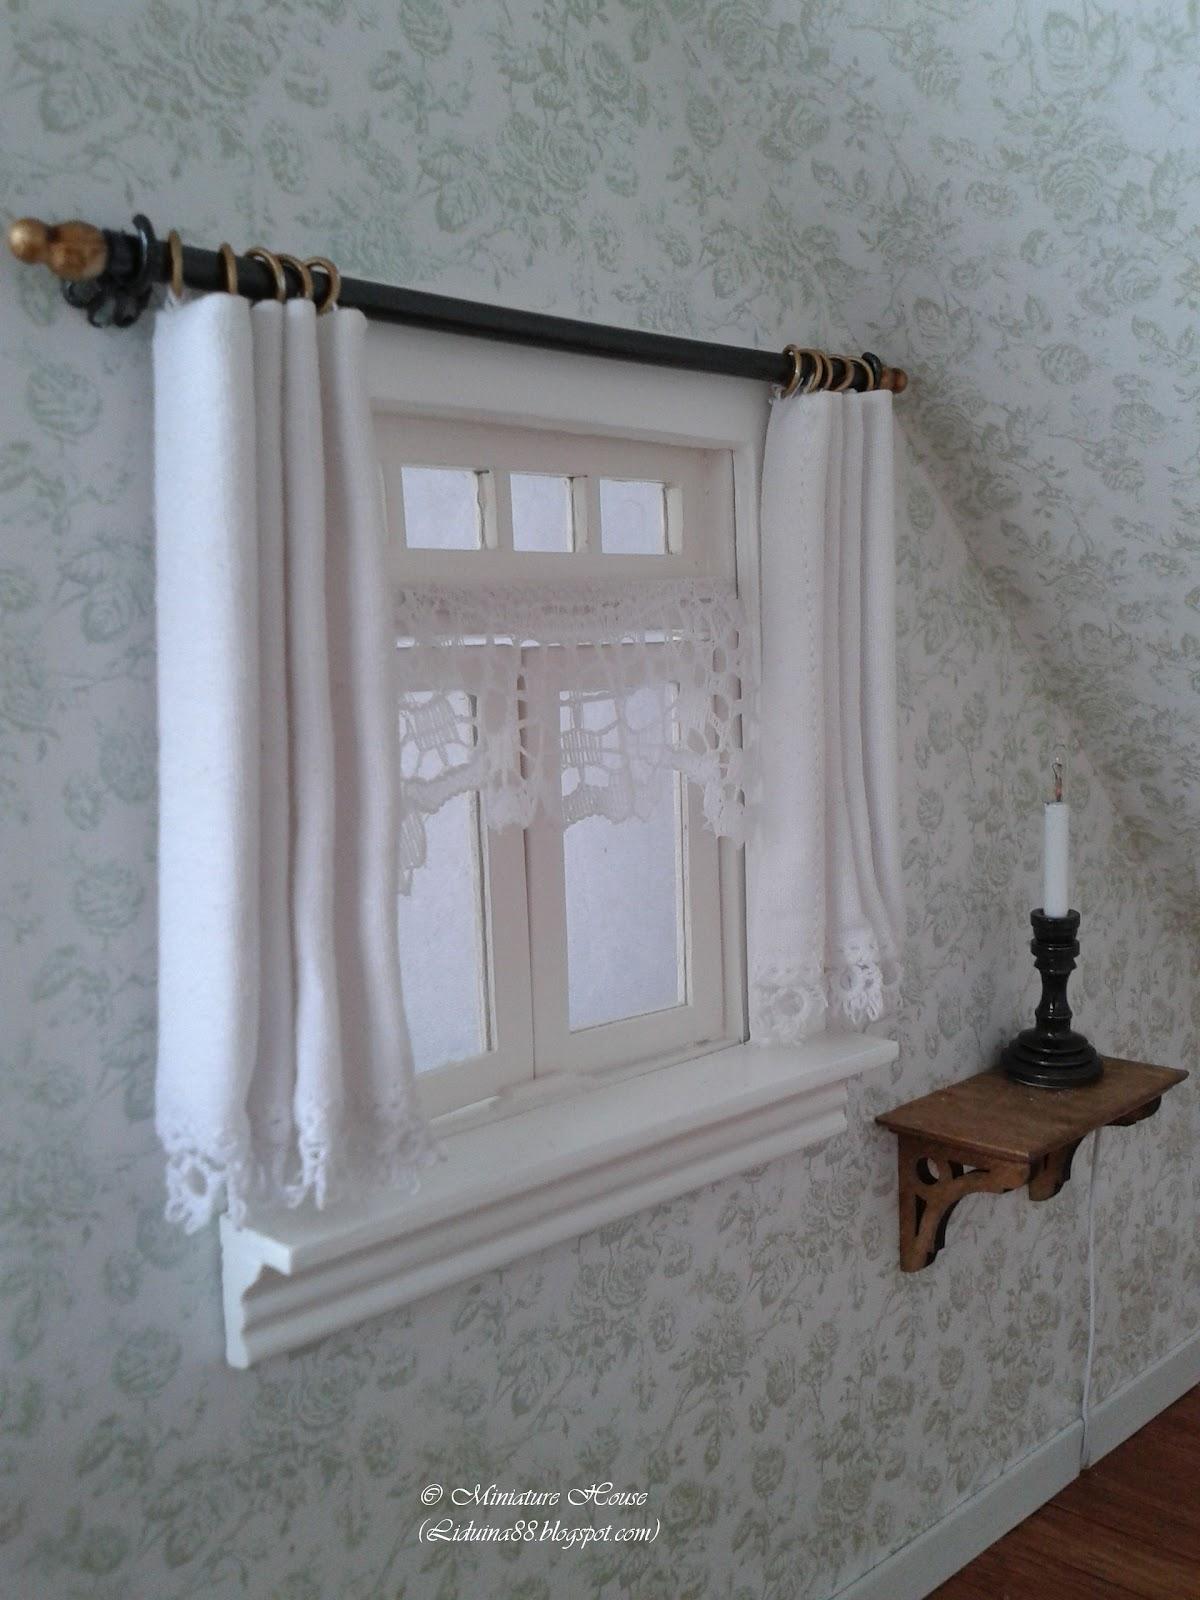 Miniature House Curtains Part Ii